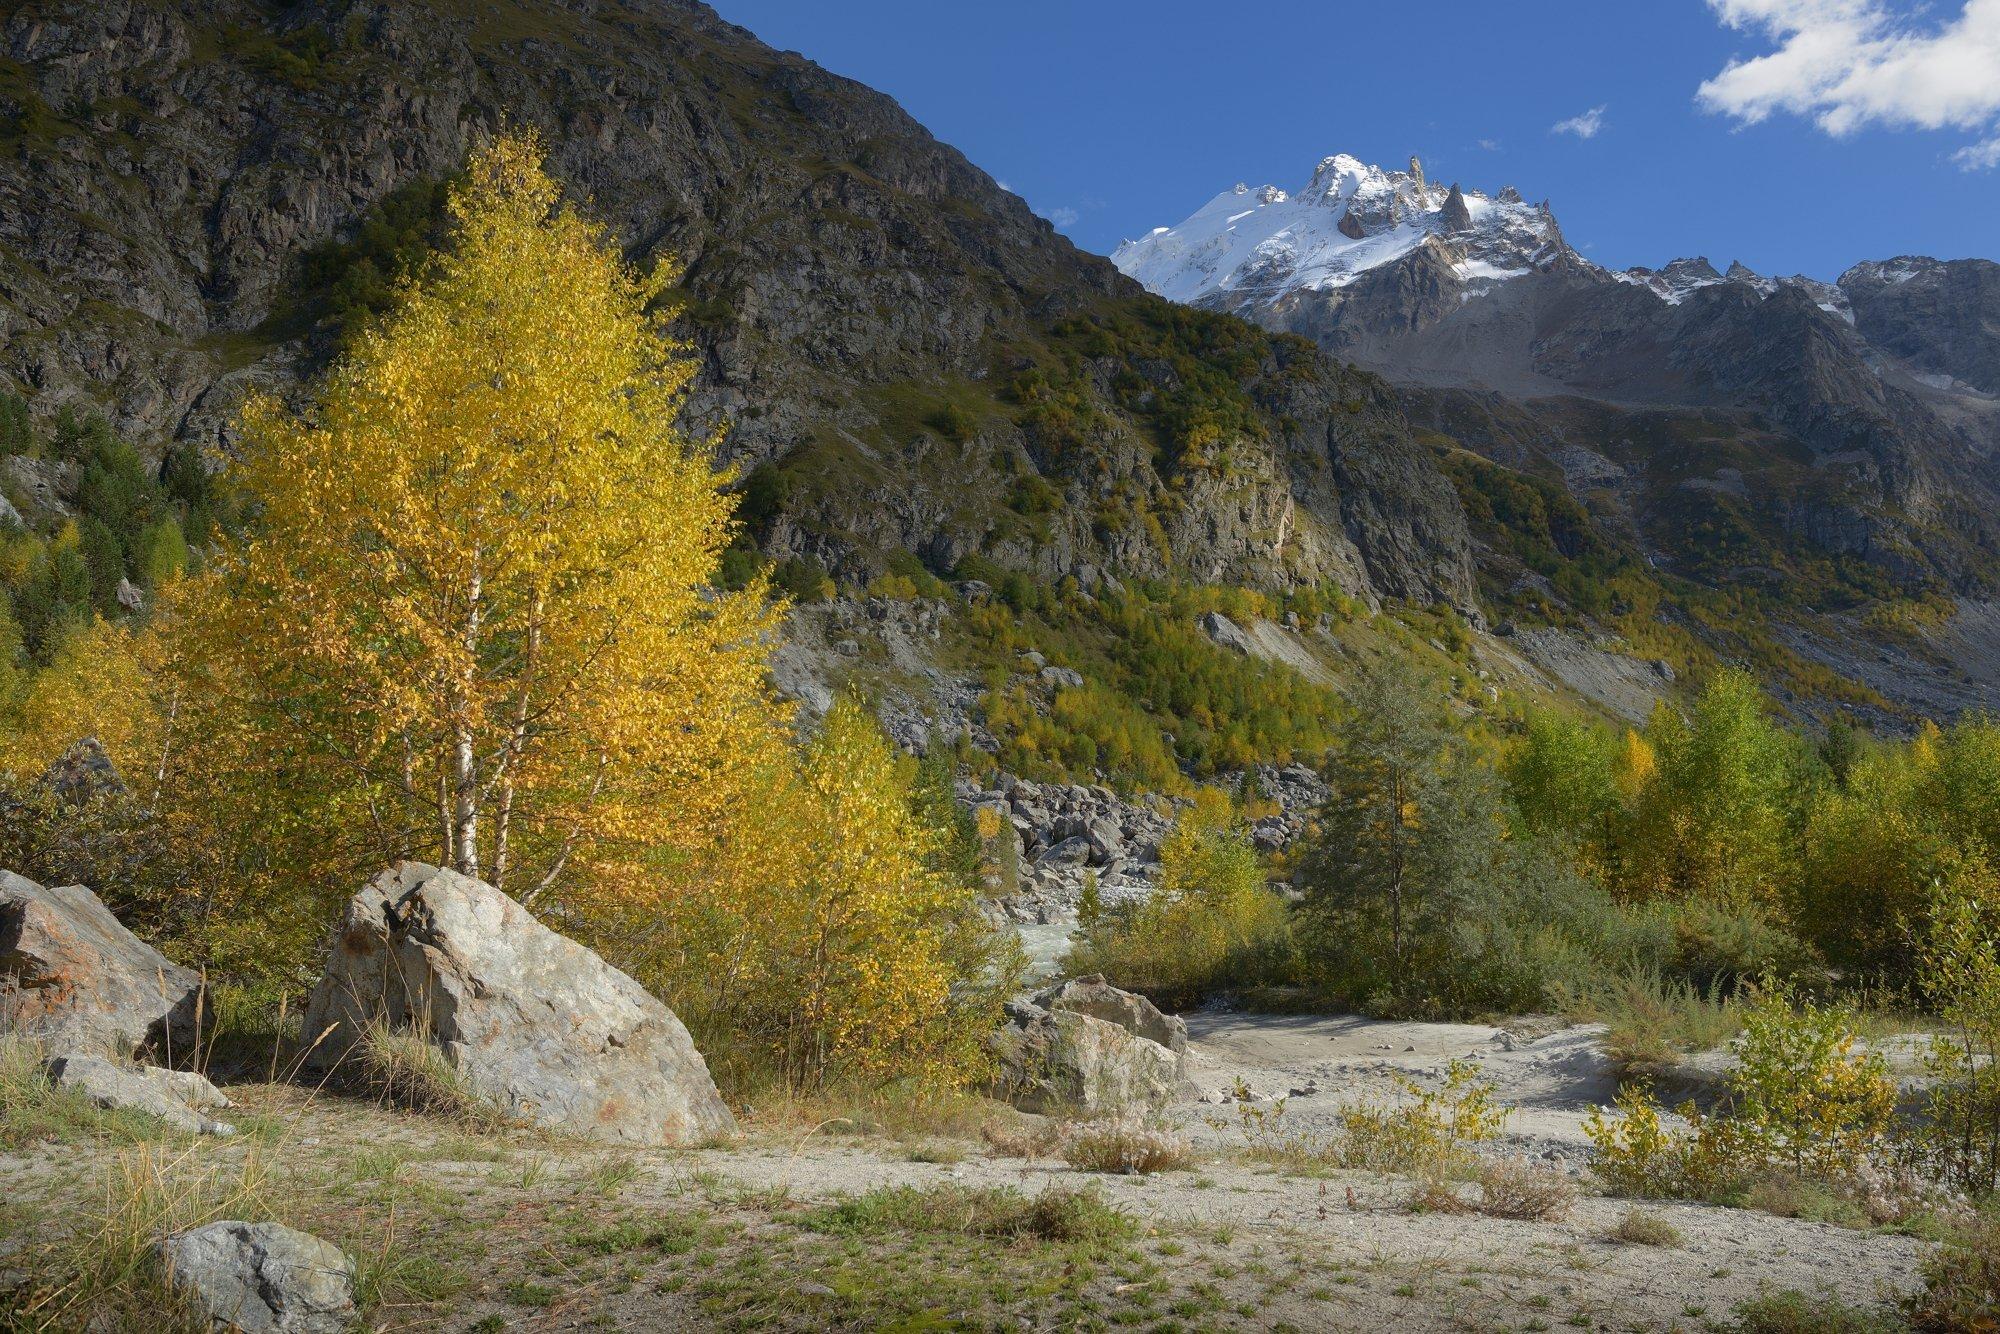 горы осень шхельда, Александр Жарников